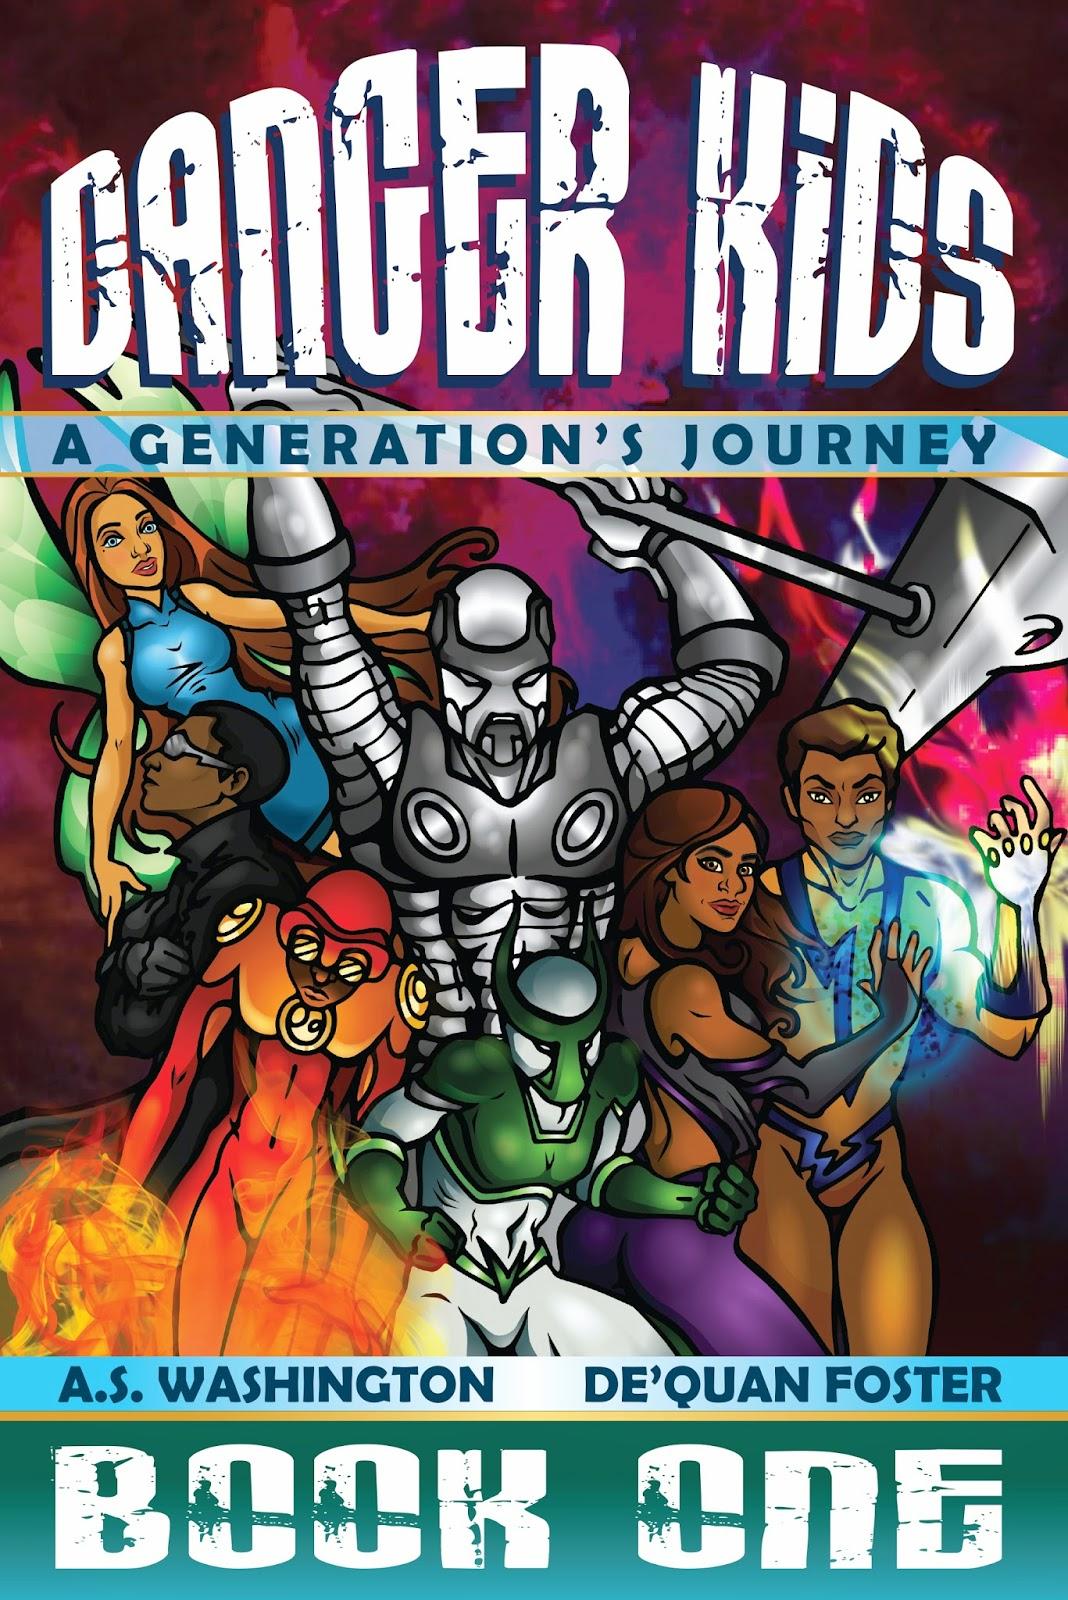 http://www.amazon.com/A-Generations-Journey-Danger-Kids-ebook/dp/B00K7U9I5G/ref=sr_1_6?ie=UTF8&qid=1400436351&sr=8-6&keywords=A+Generation%27s+Journey